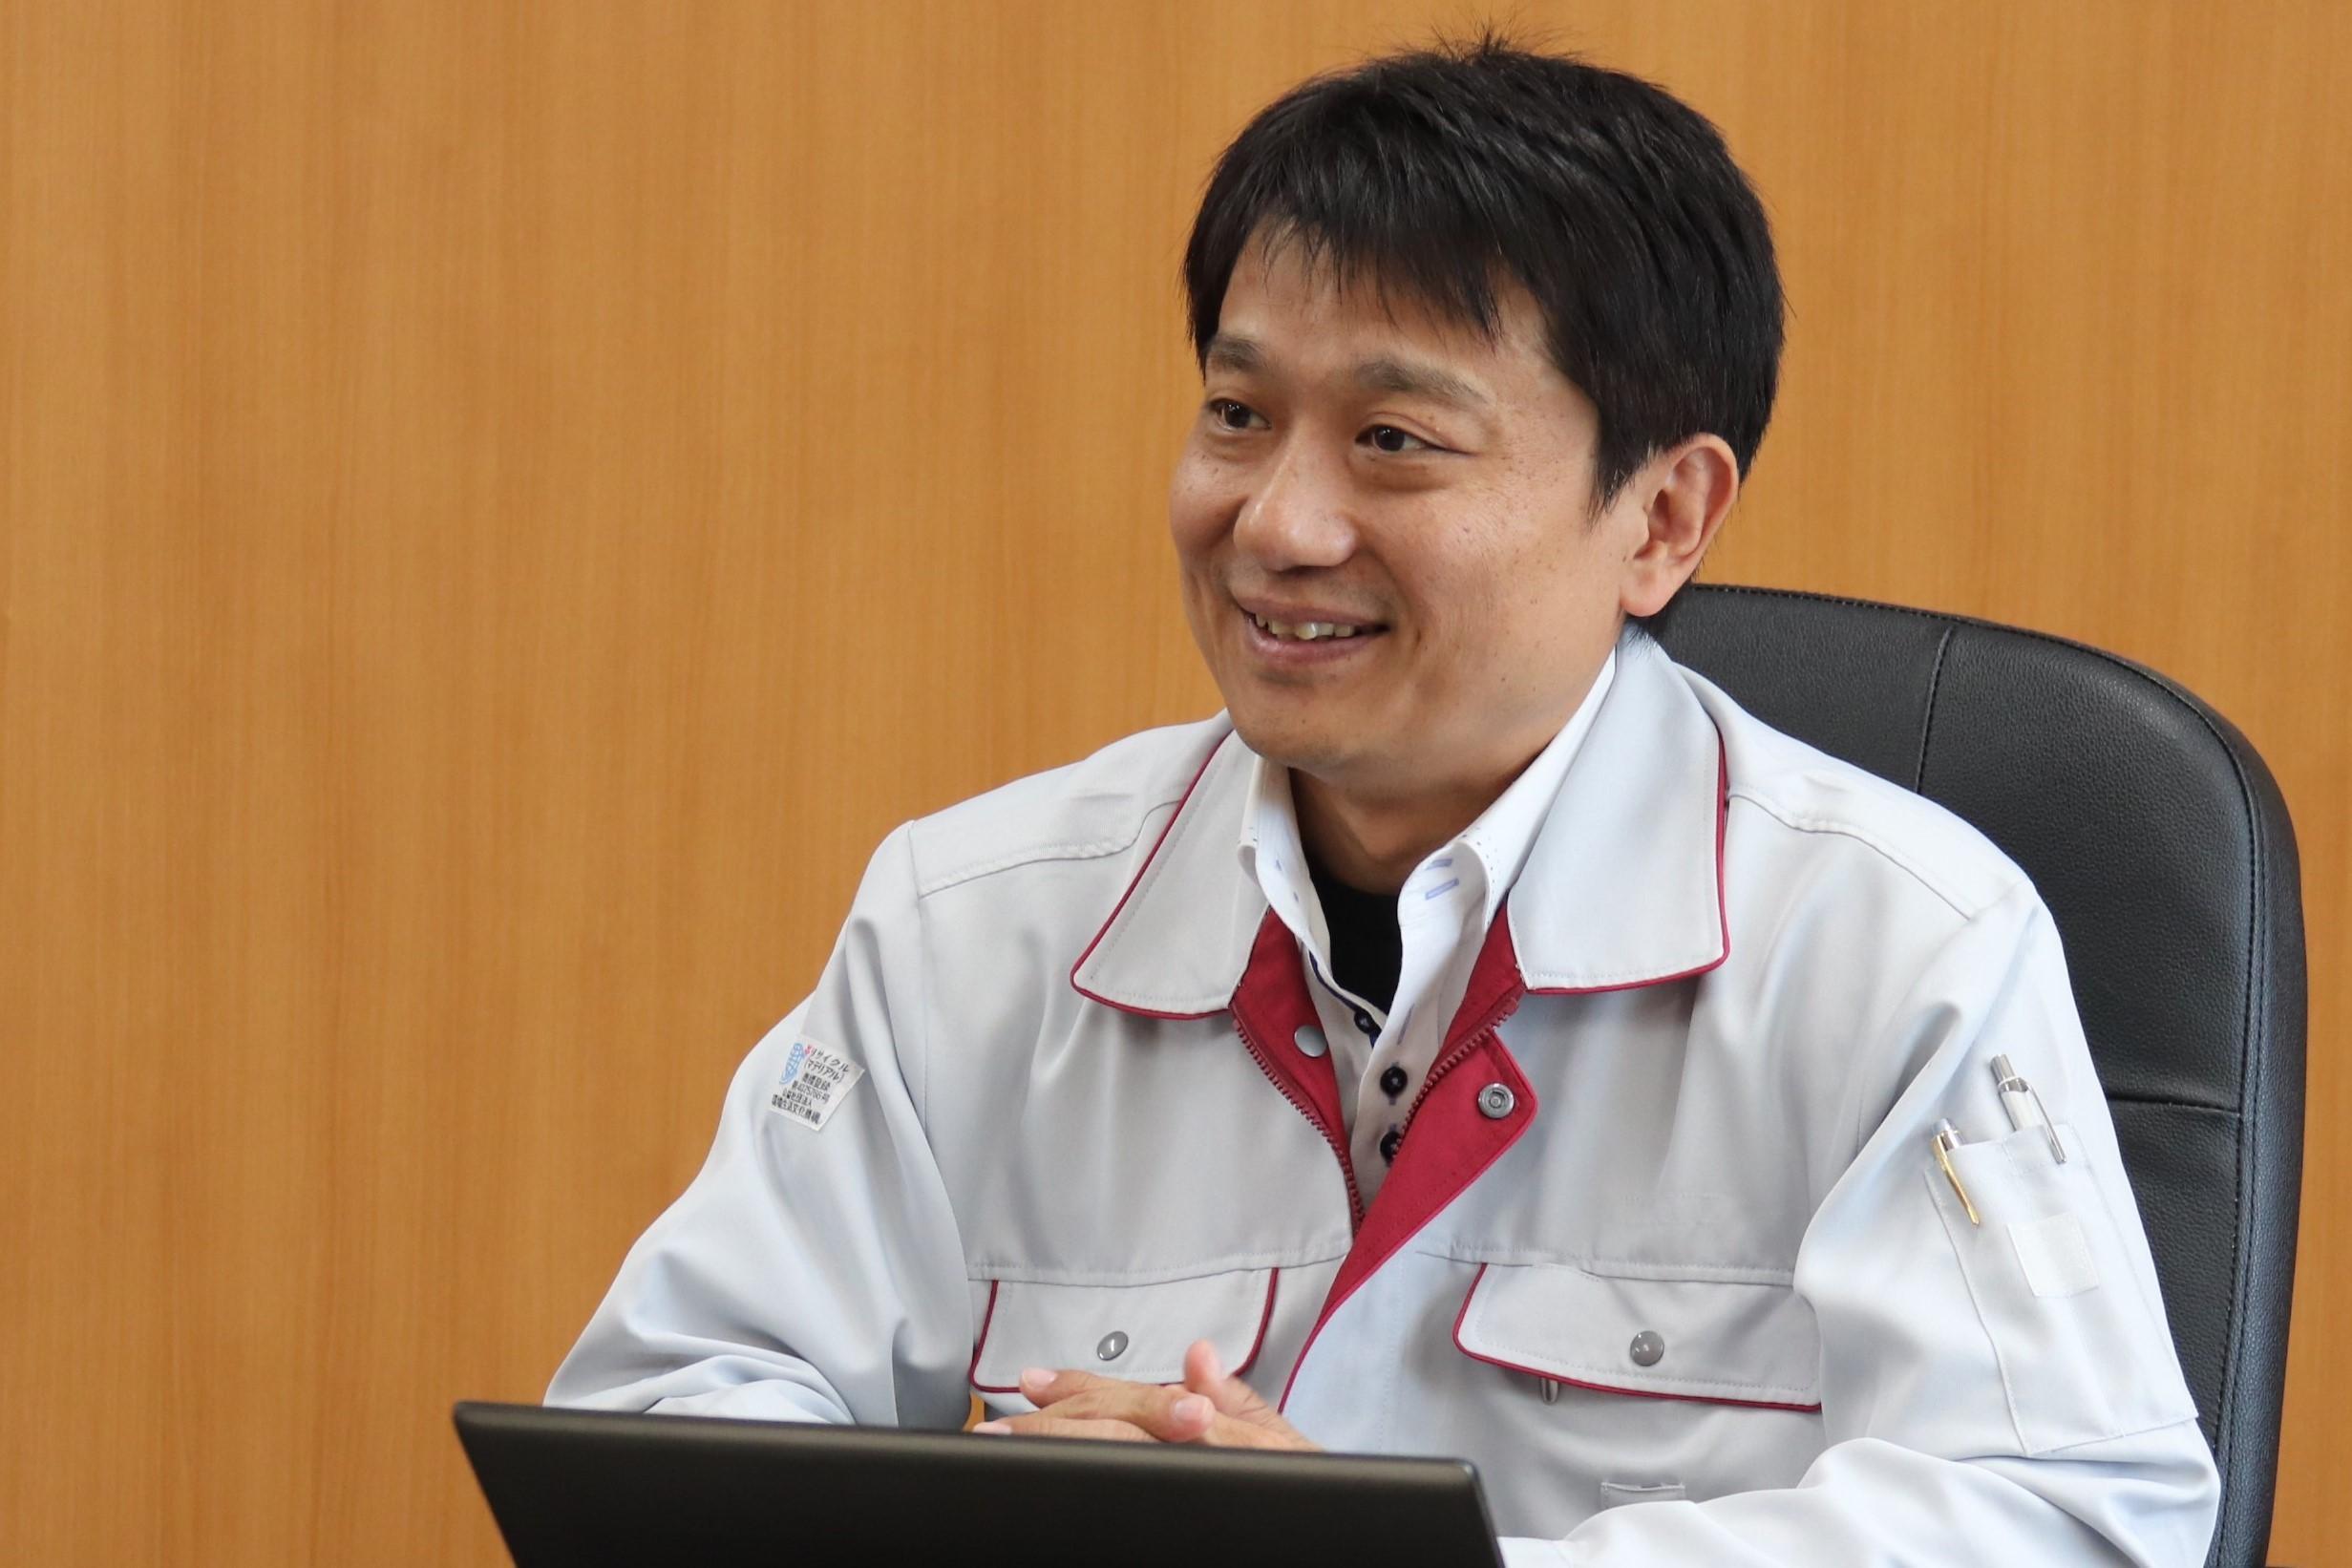 Yuichi Okazaki, Oita Operations Manufacturing Department, Japan Semiconductor Corporation